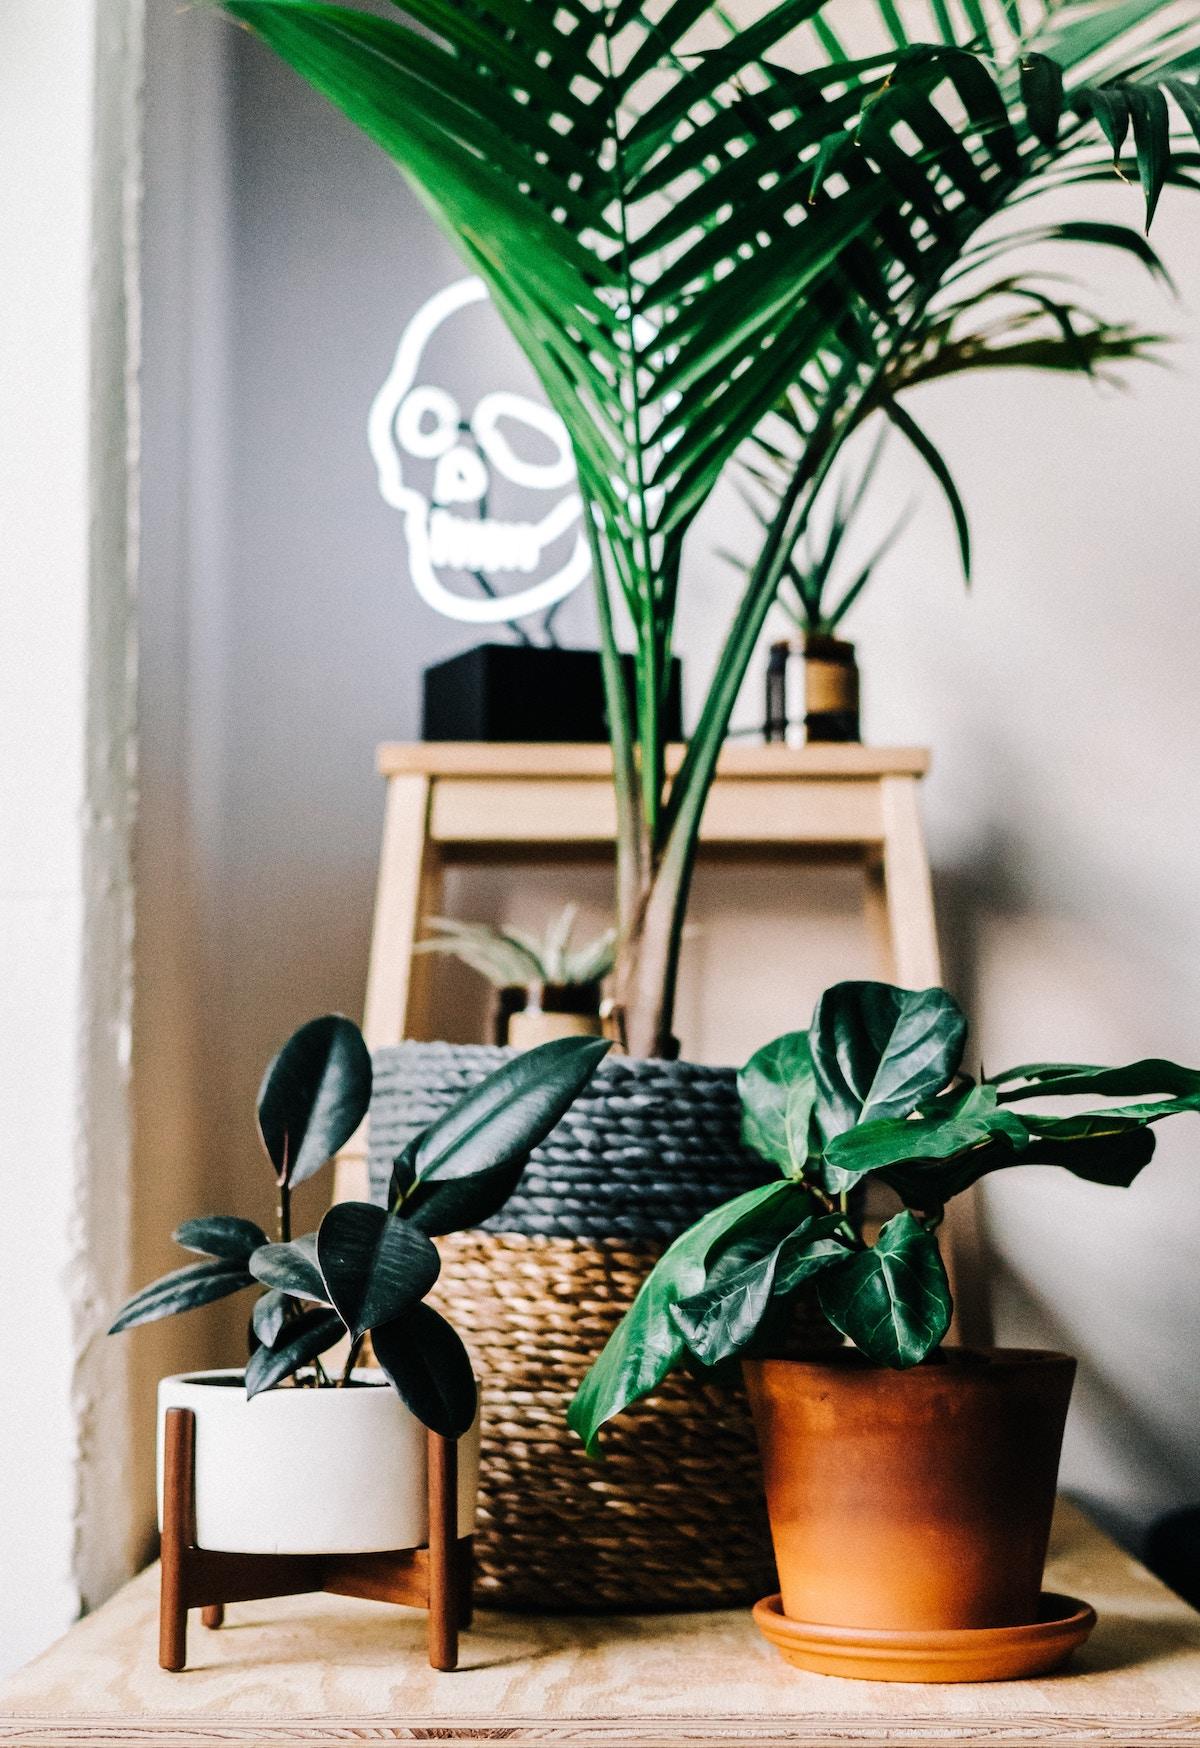 Multiple house plants